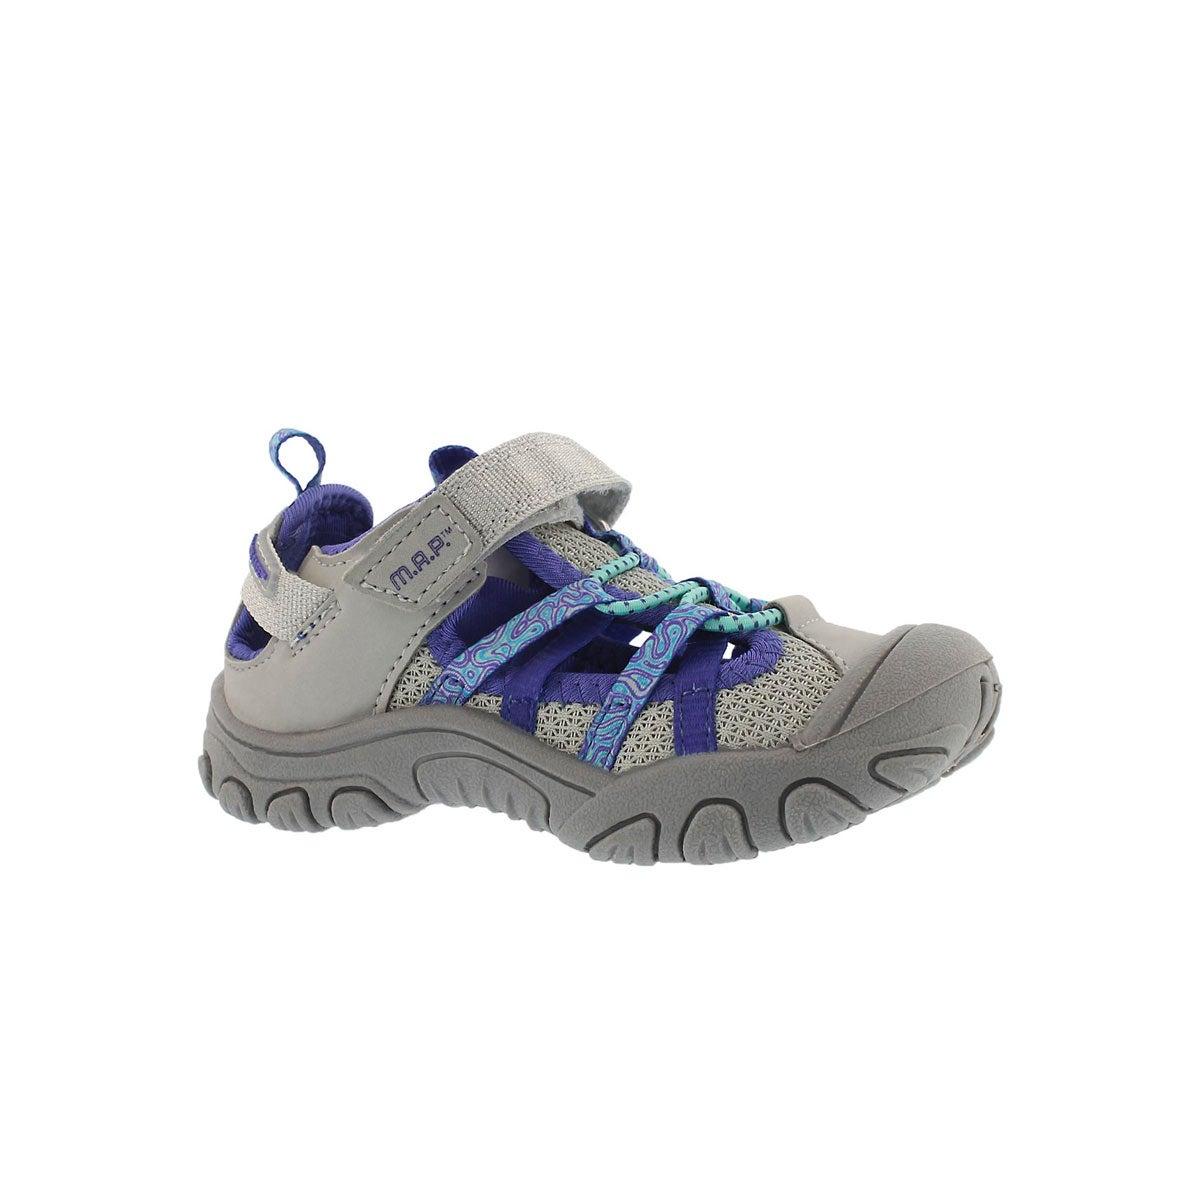 Infants' NIAGARA silver/purple fisherman sandals